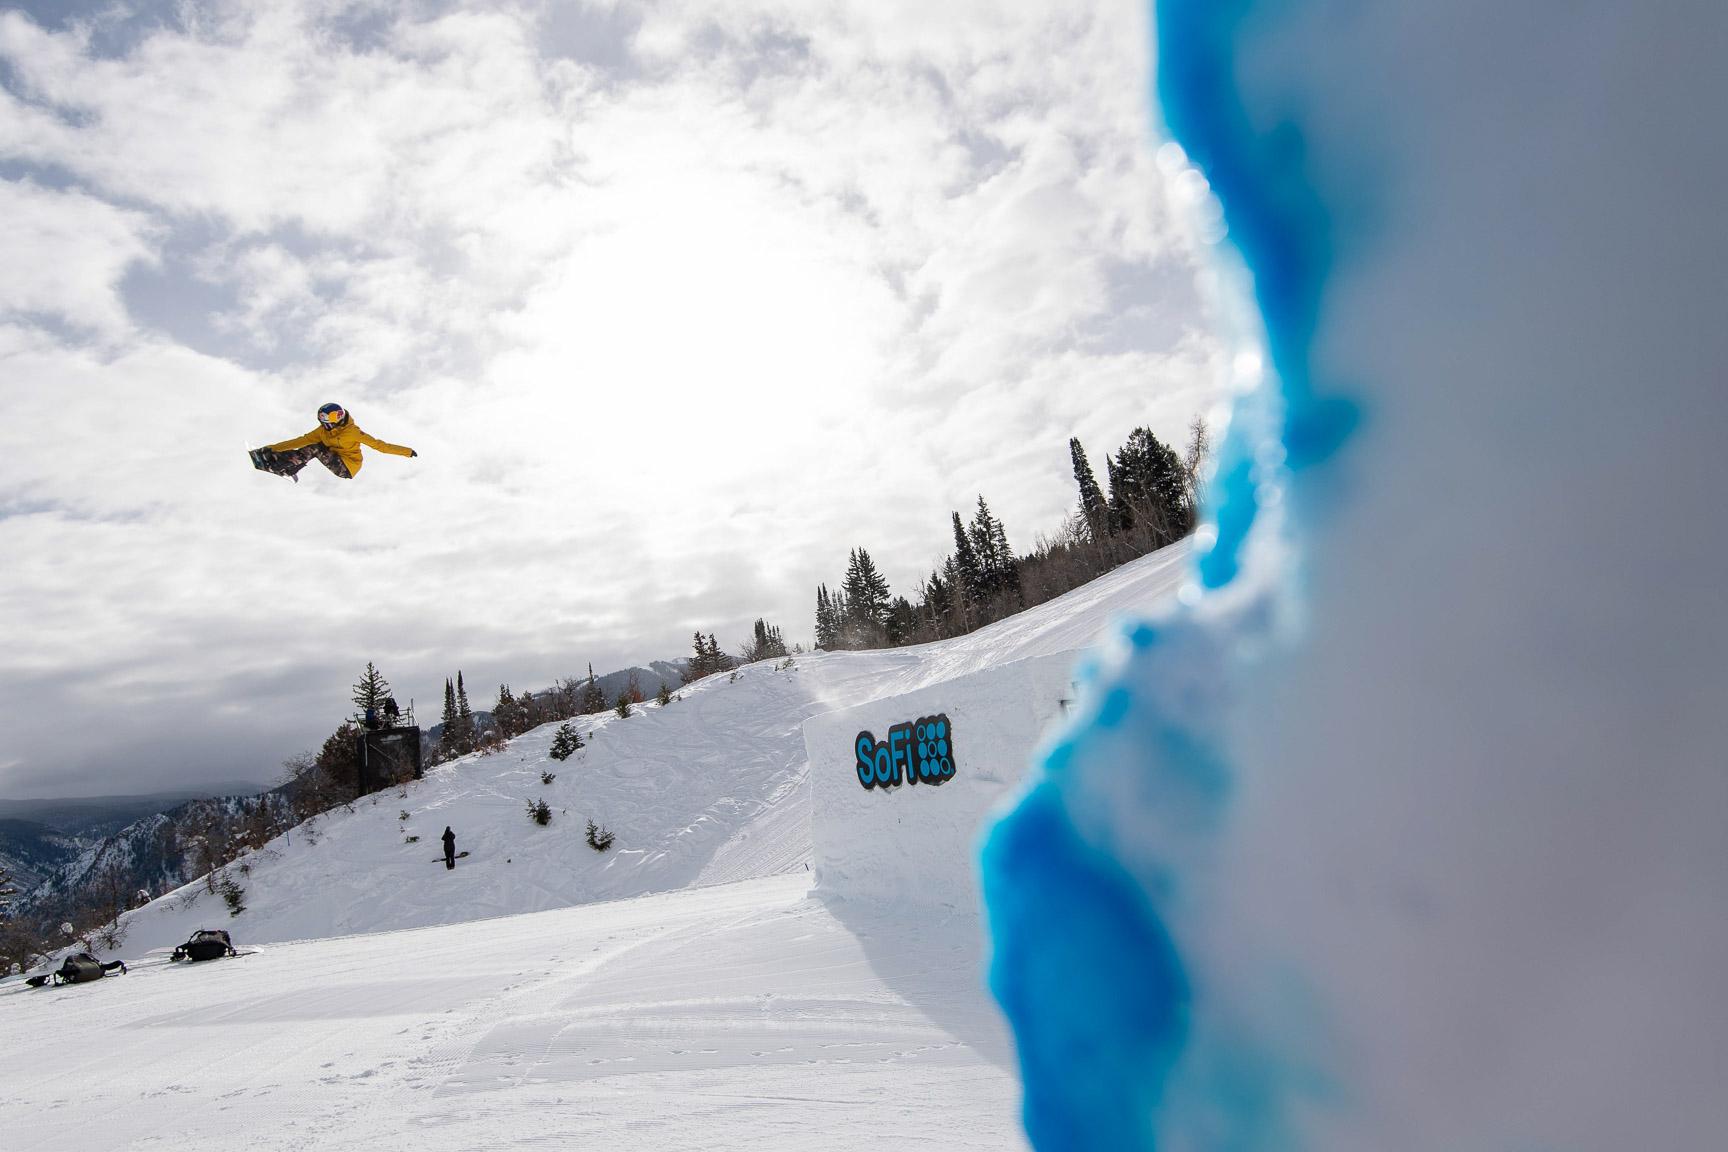 Hailey Langland, Women's Snowboard Slopestyle